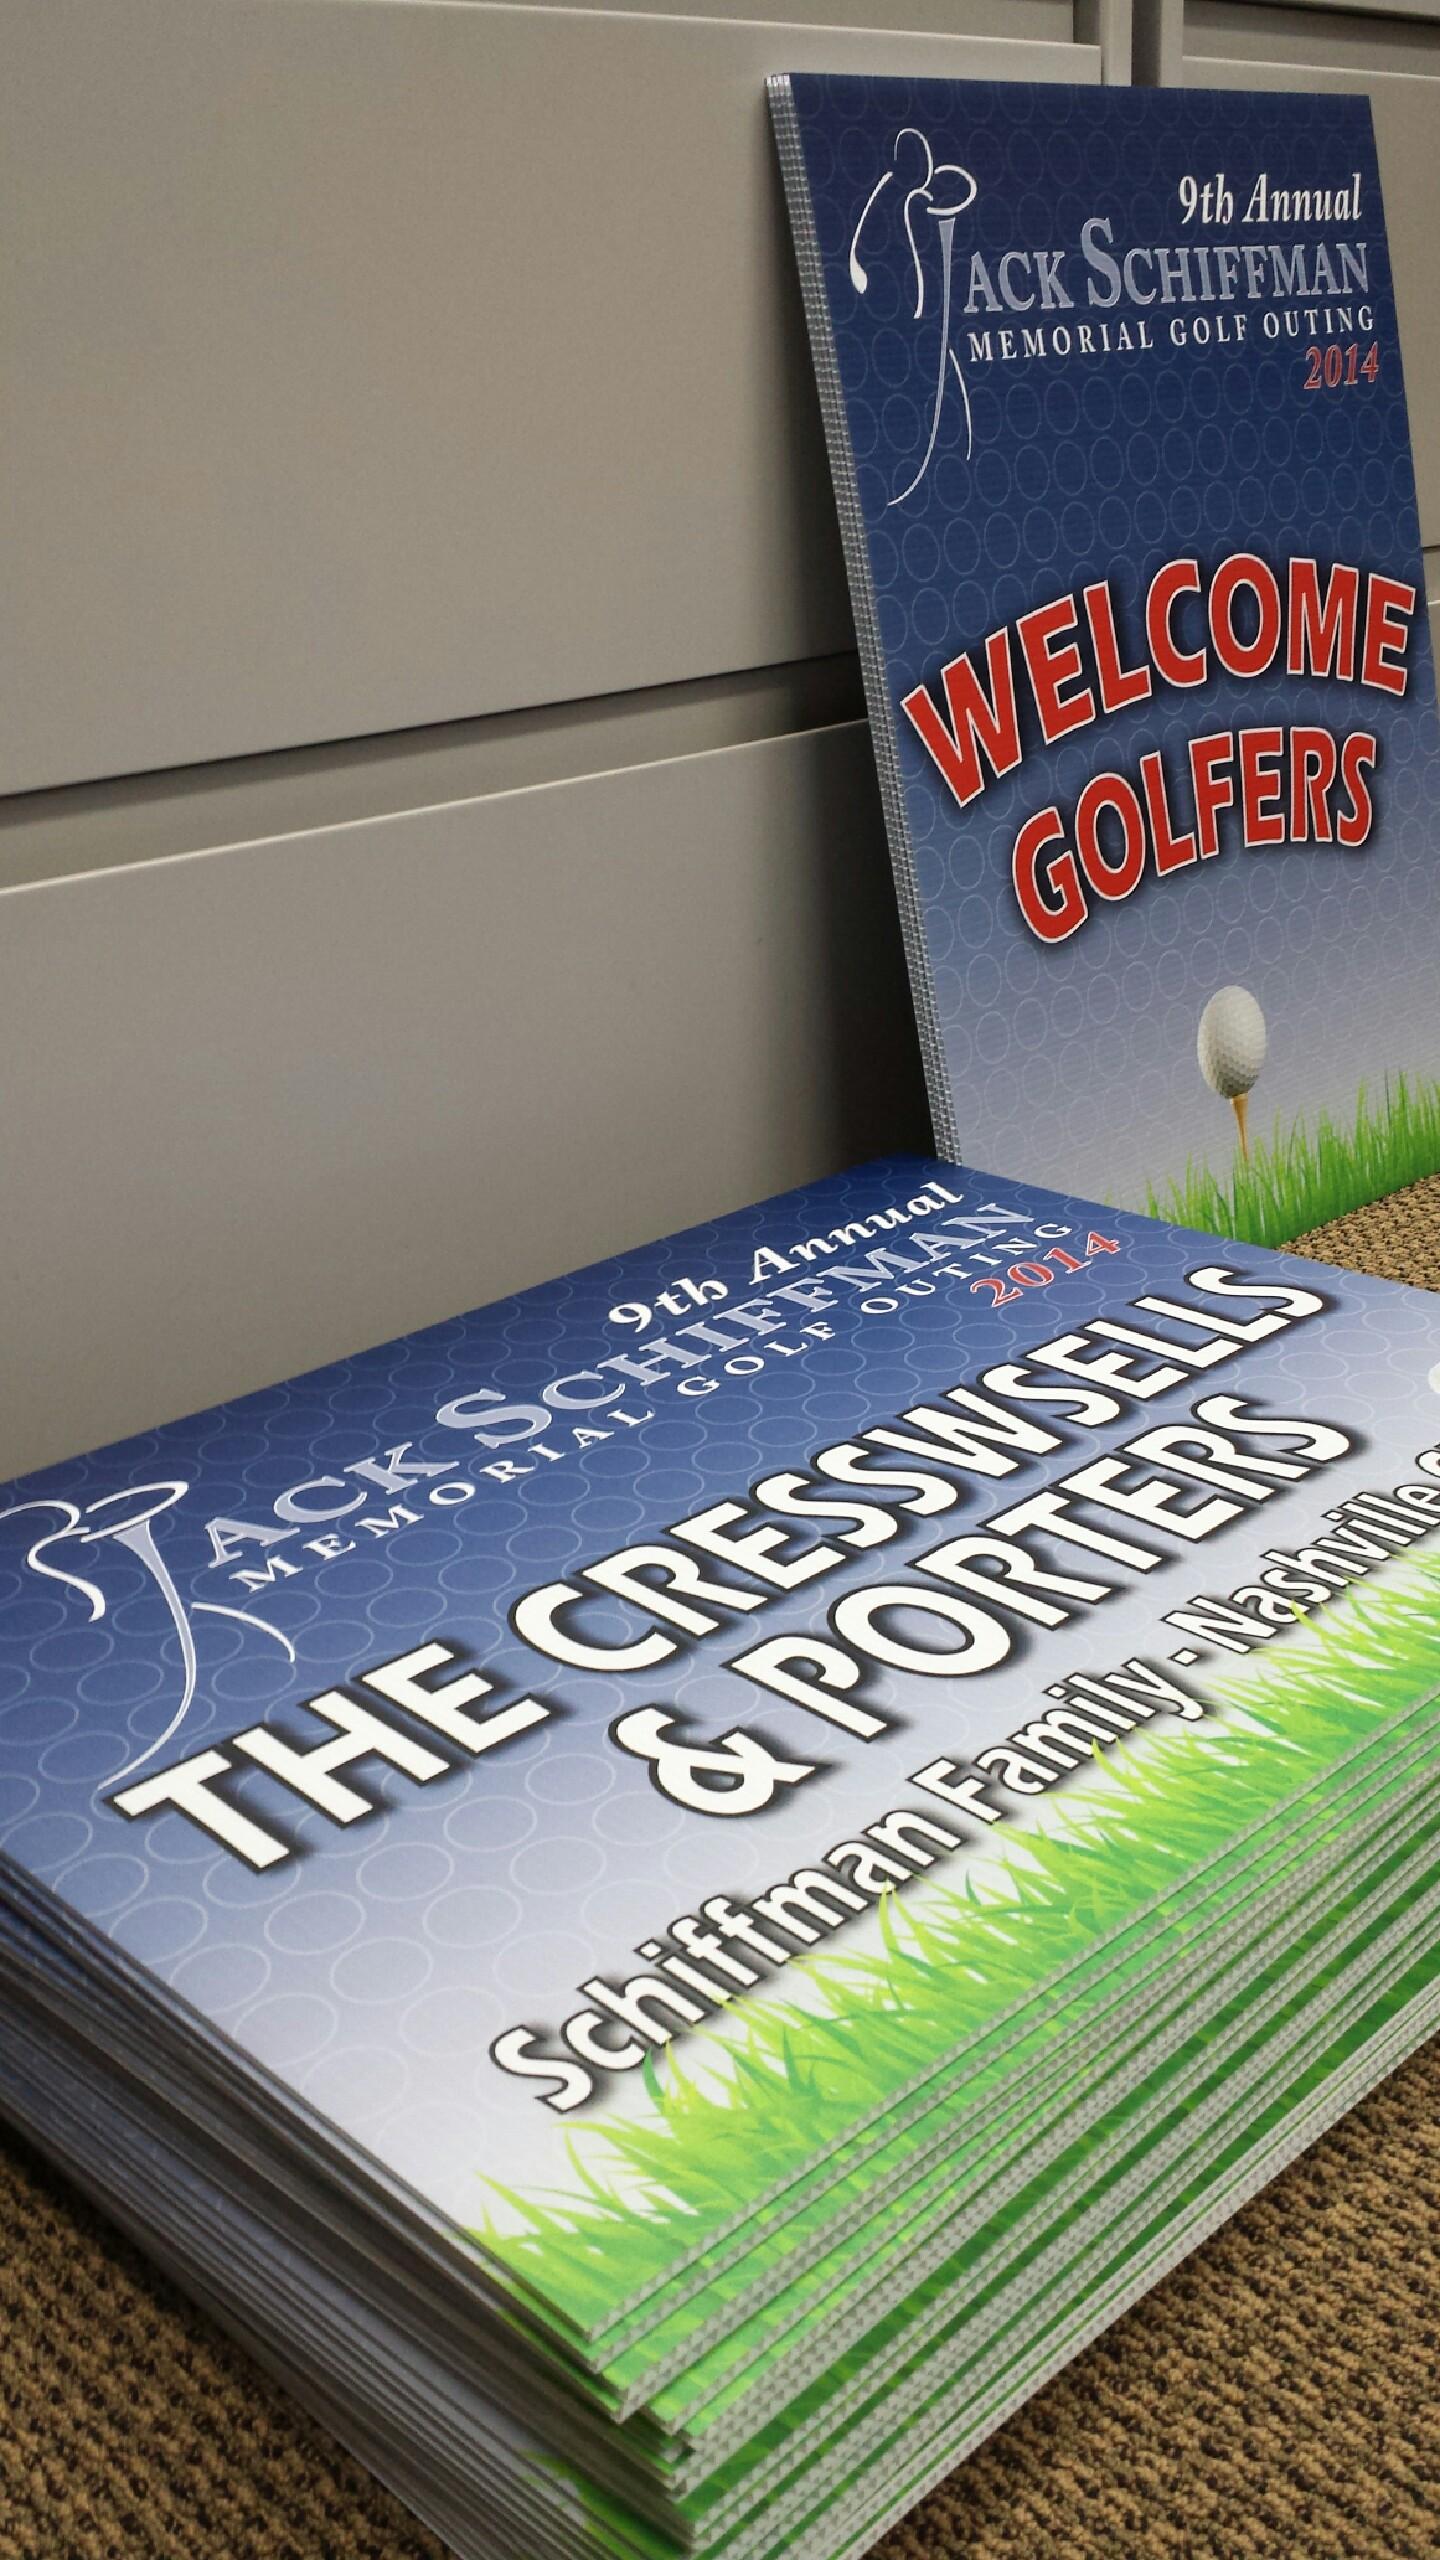 Jack Schiffman Memorial Golf Outing